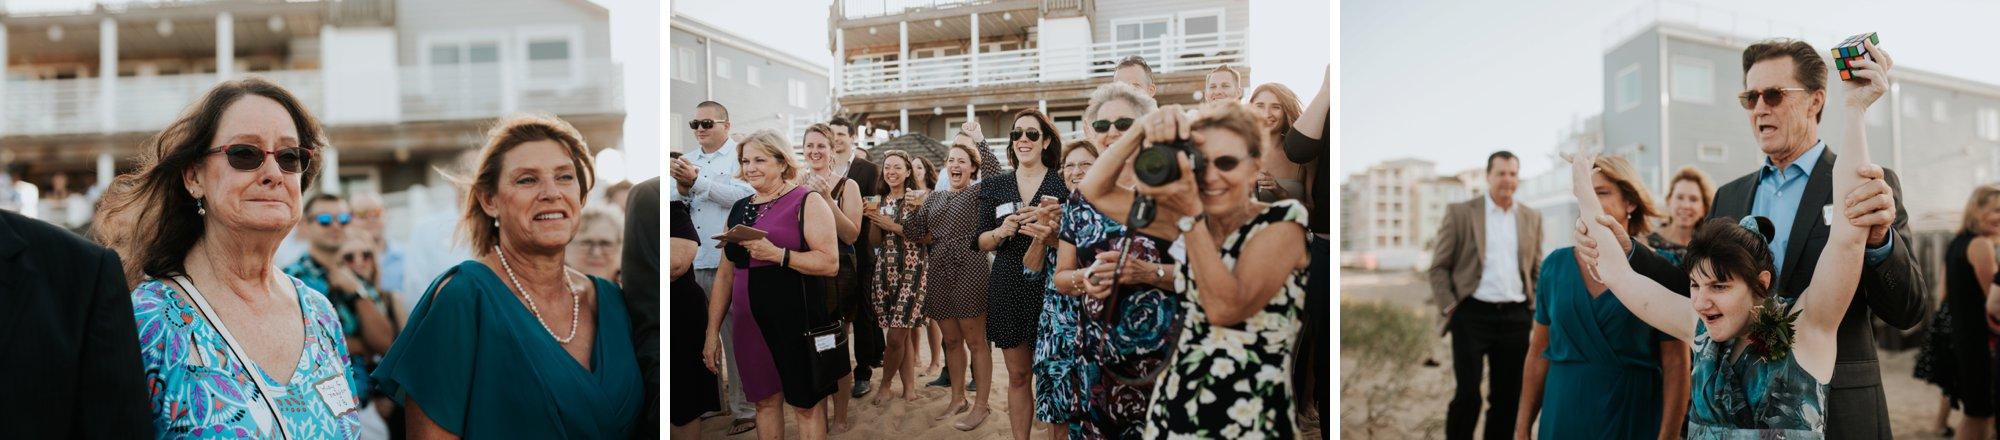 Low key backyard beach wedding in Sandbridge, VA friends family